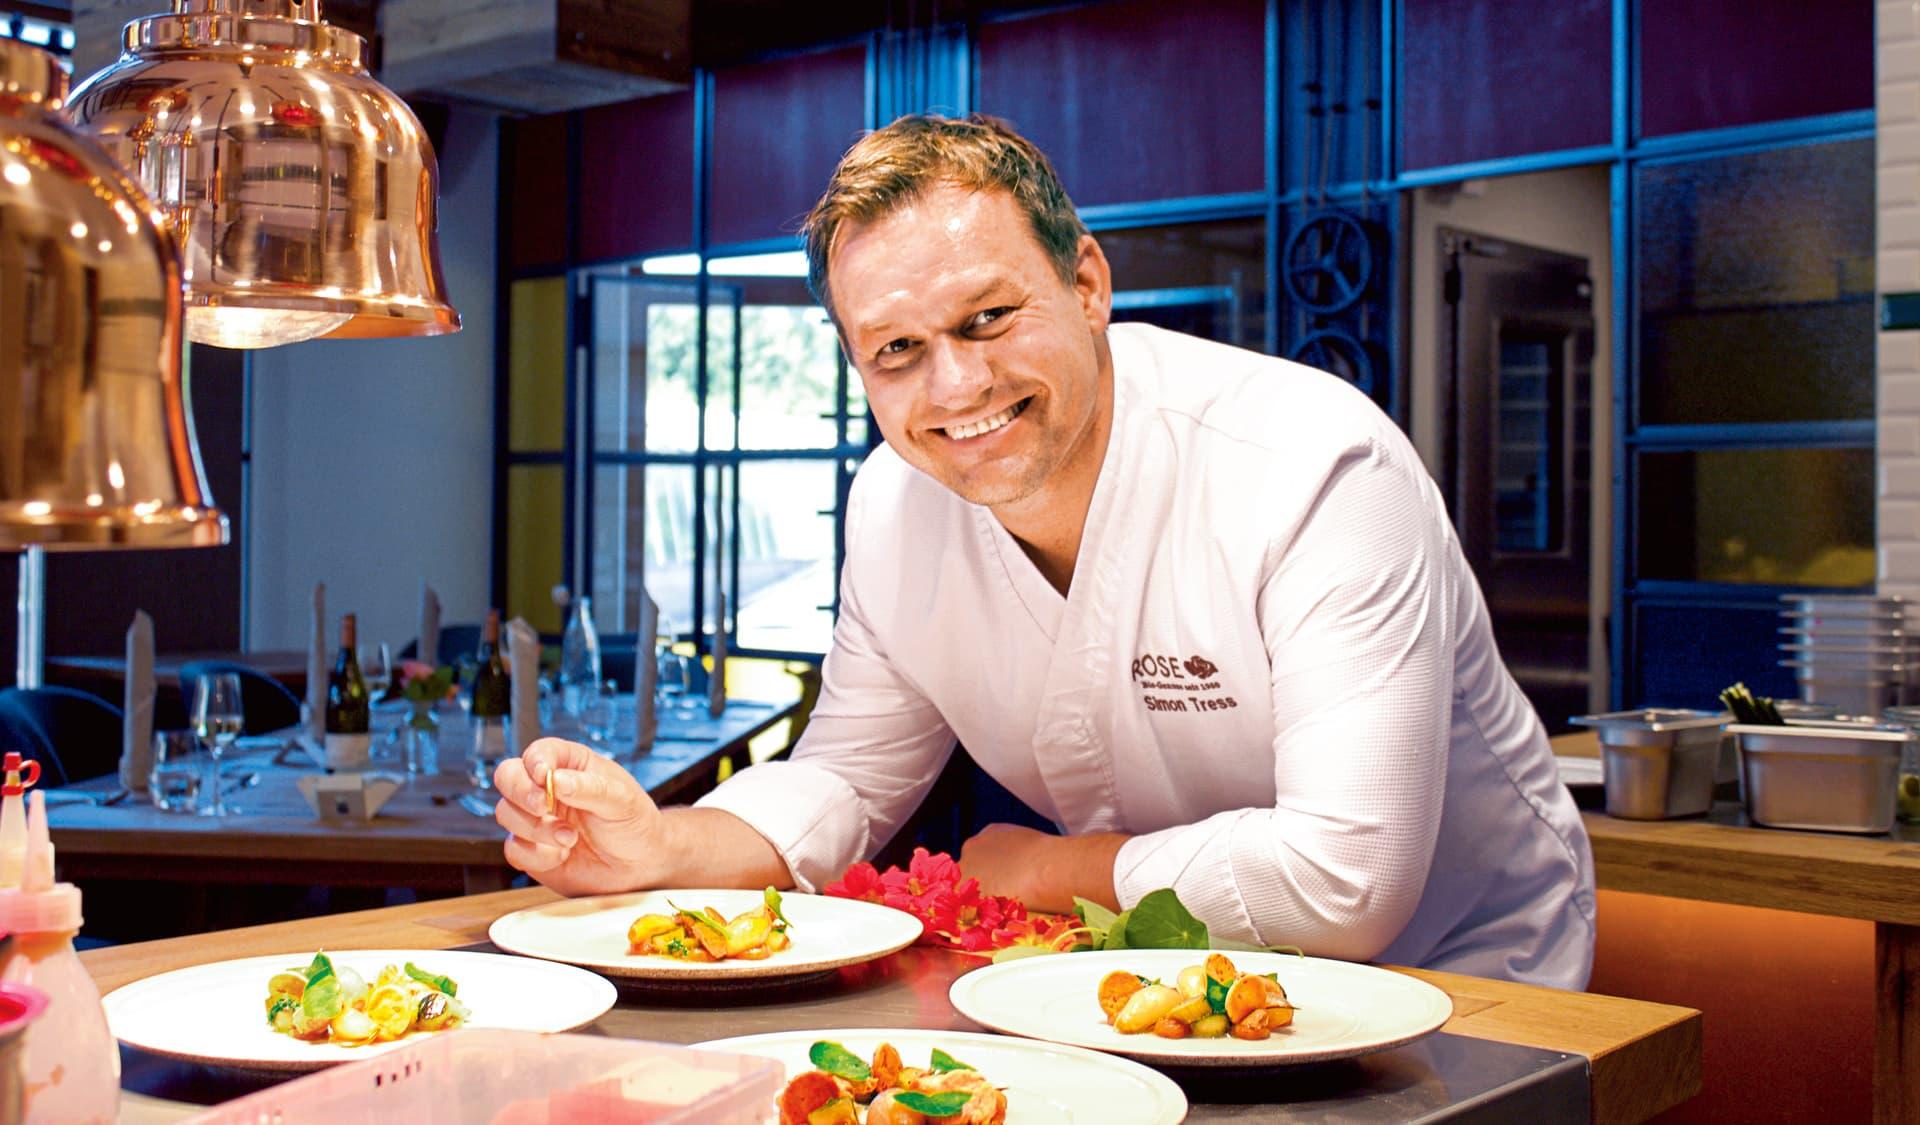 Bio-Koch Simon Tress in seinem Restaurant